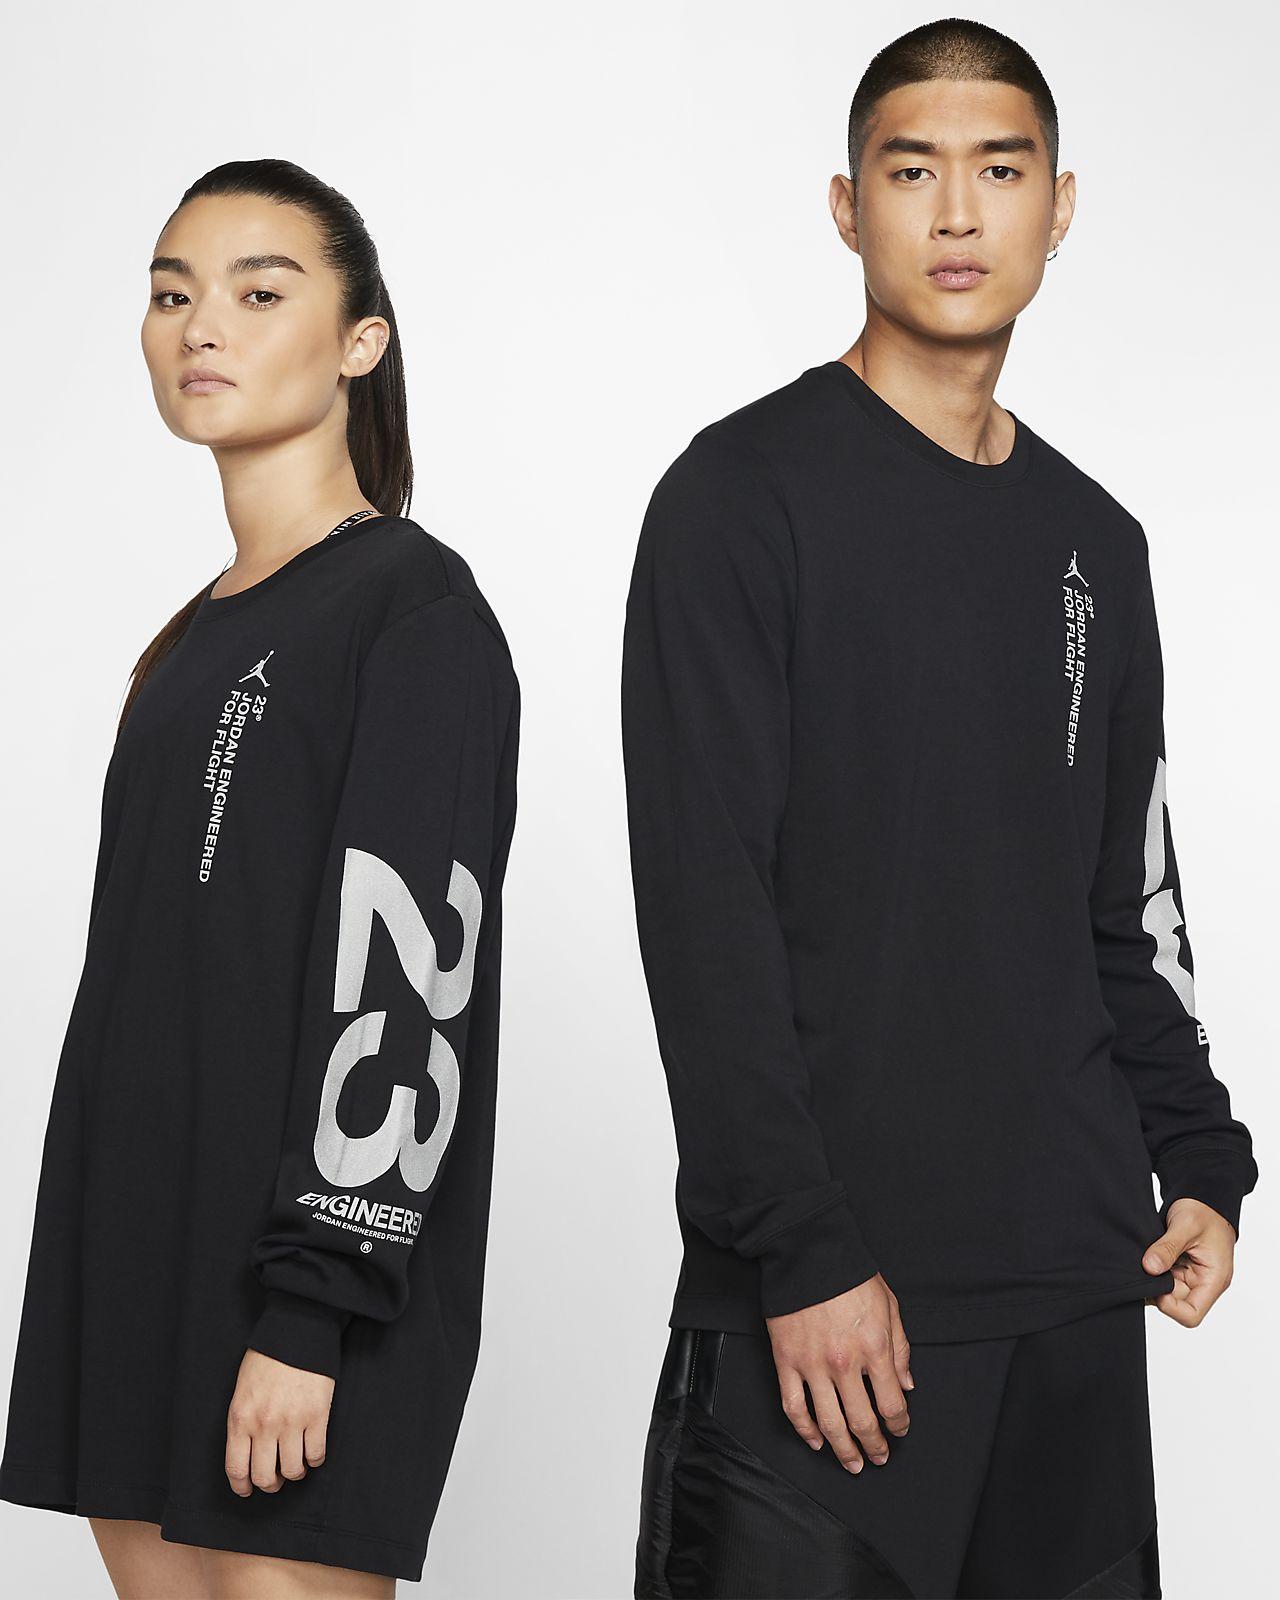 Jordan 23 Engineered Long-Sleeve T-Shirt